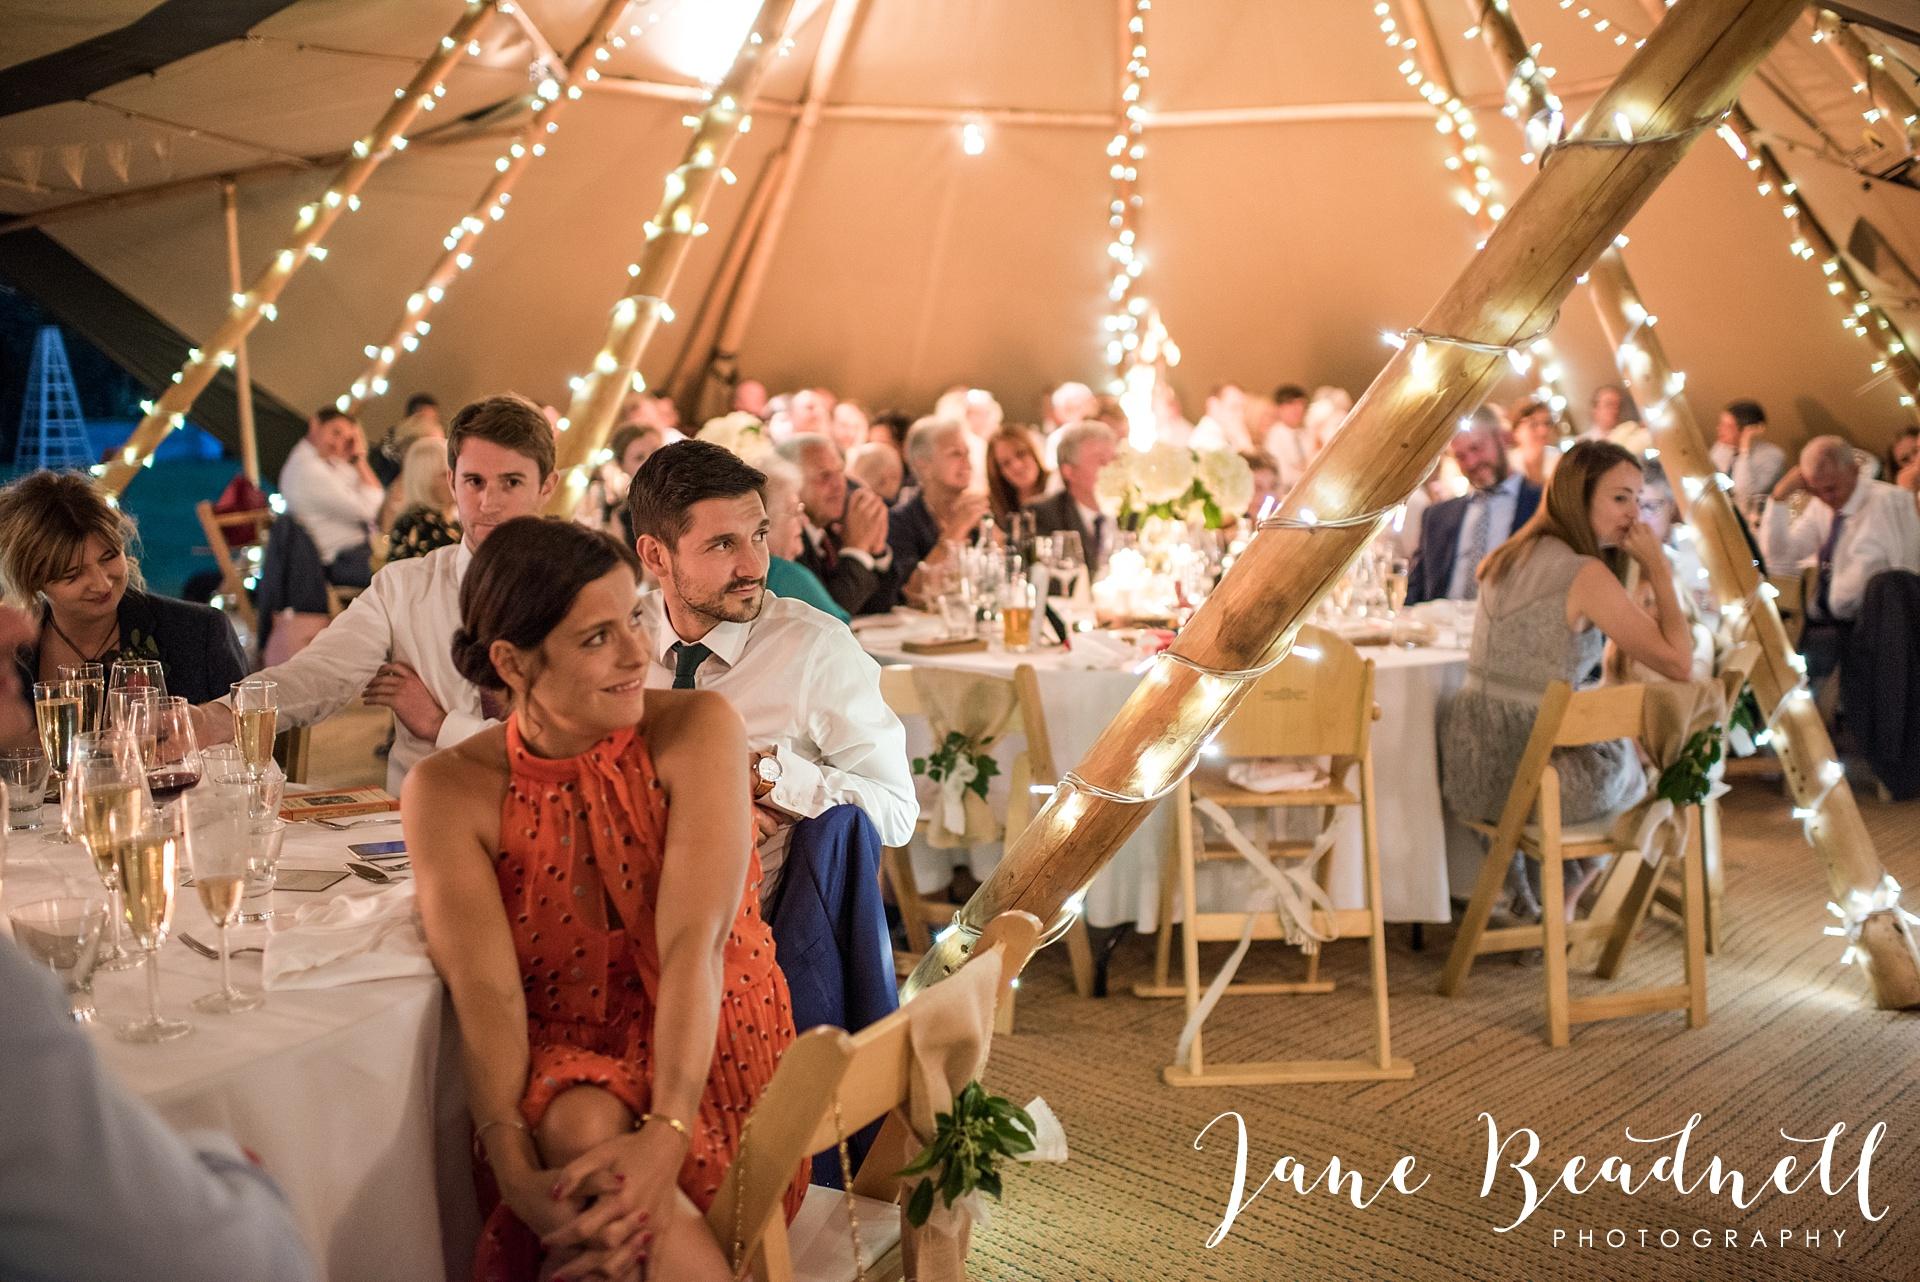 fine-art-wedding-photographer-jane-beadnell-yorkshire-wedding-photographer_0145